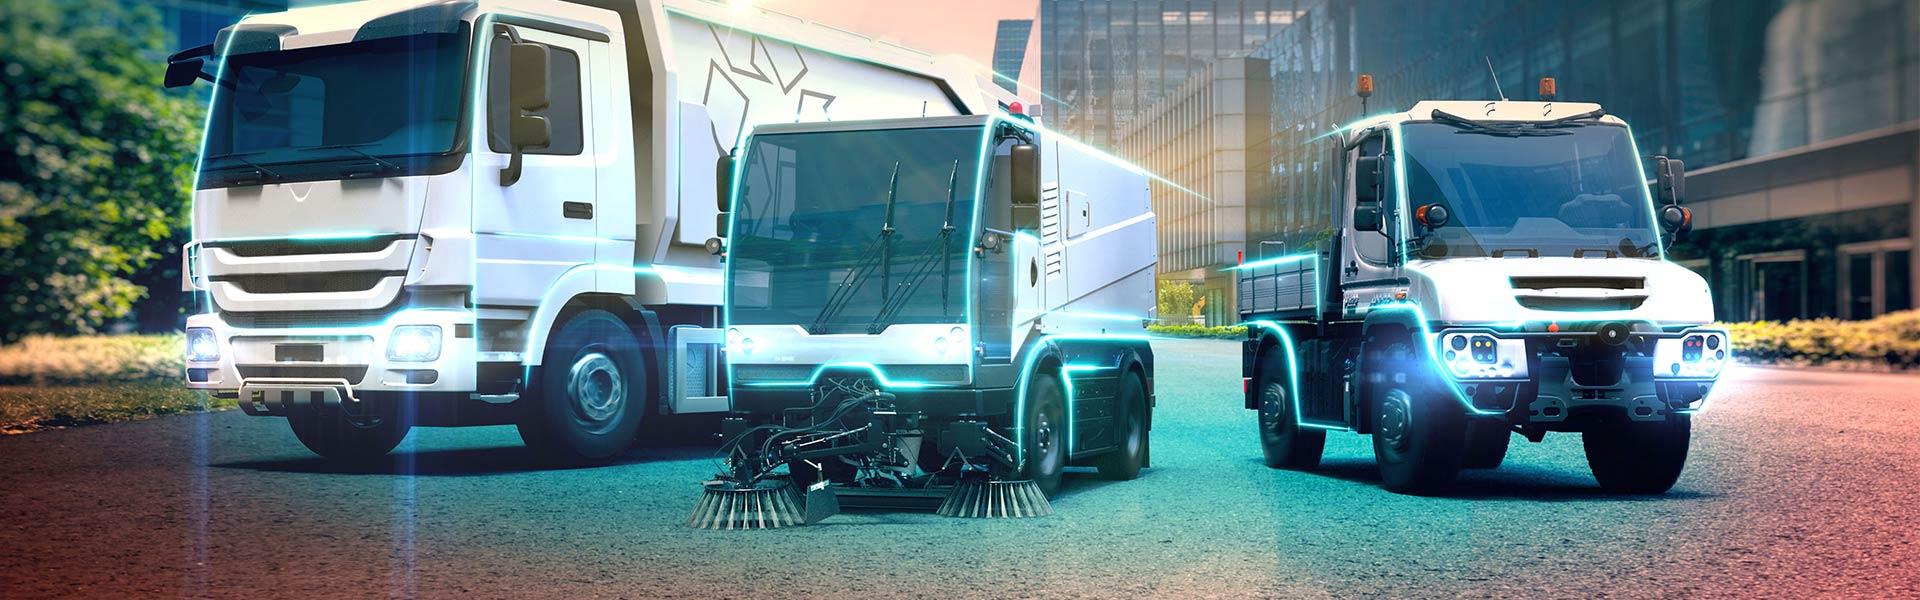 webasto_municipal_vehicles_header_low_res_1920x600